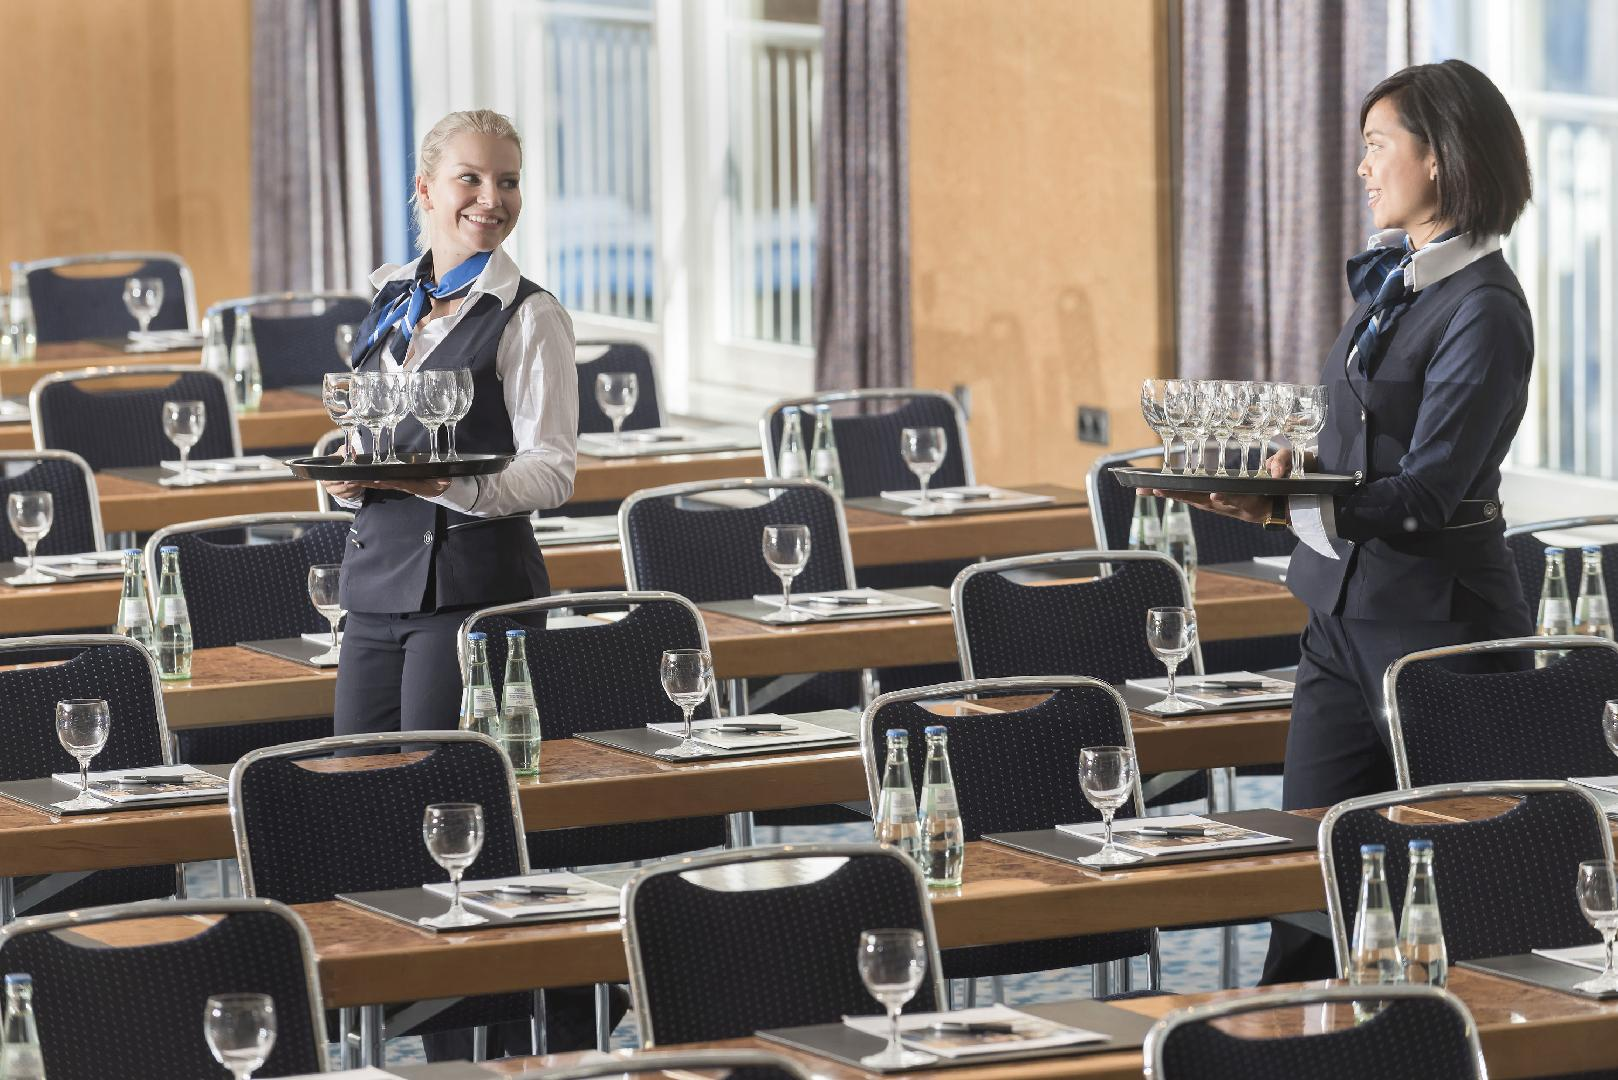 Bild 2 von Saal II im Maritim proArte Hotel Berlin